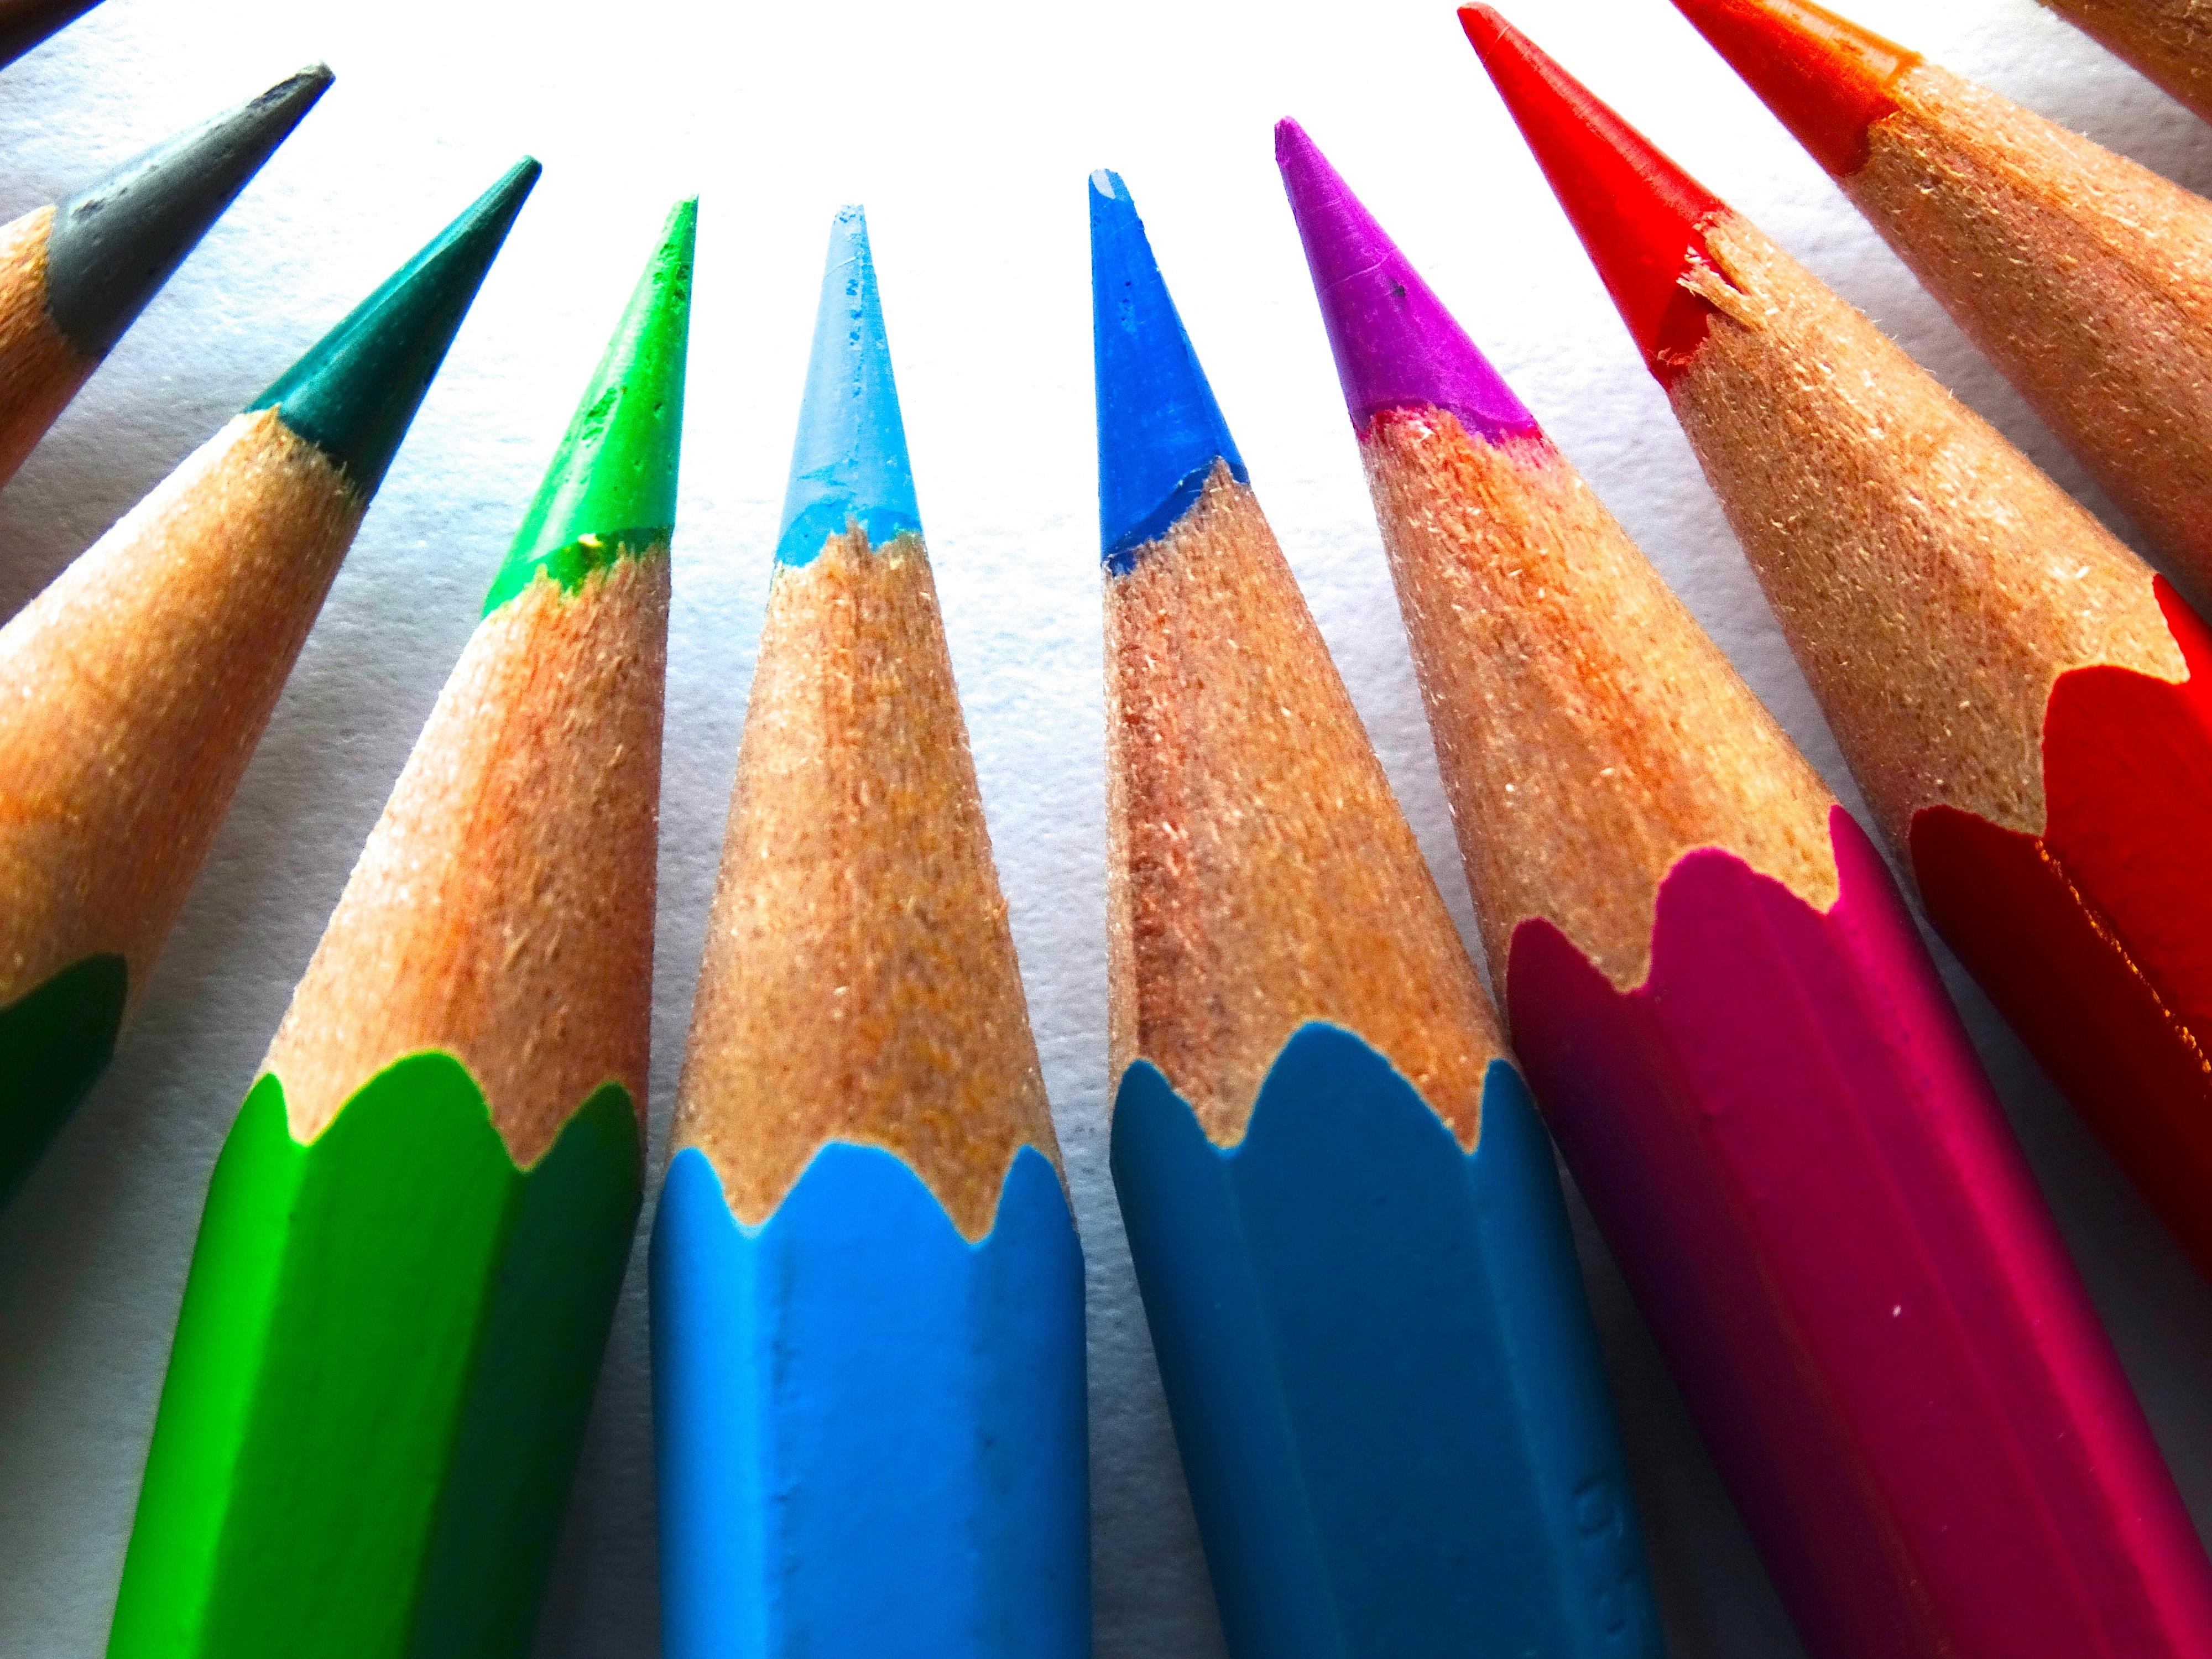 Fotos Gratis Macro Pintar Vistoso Lápiz De Color Plumas